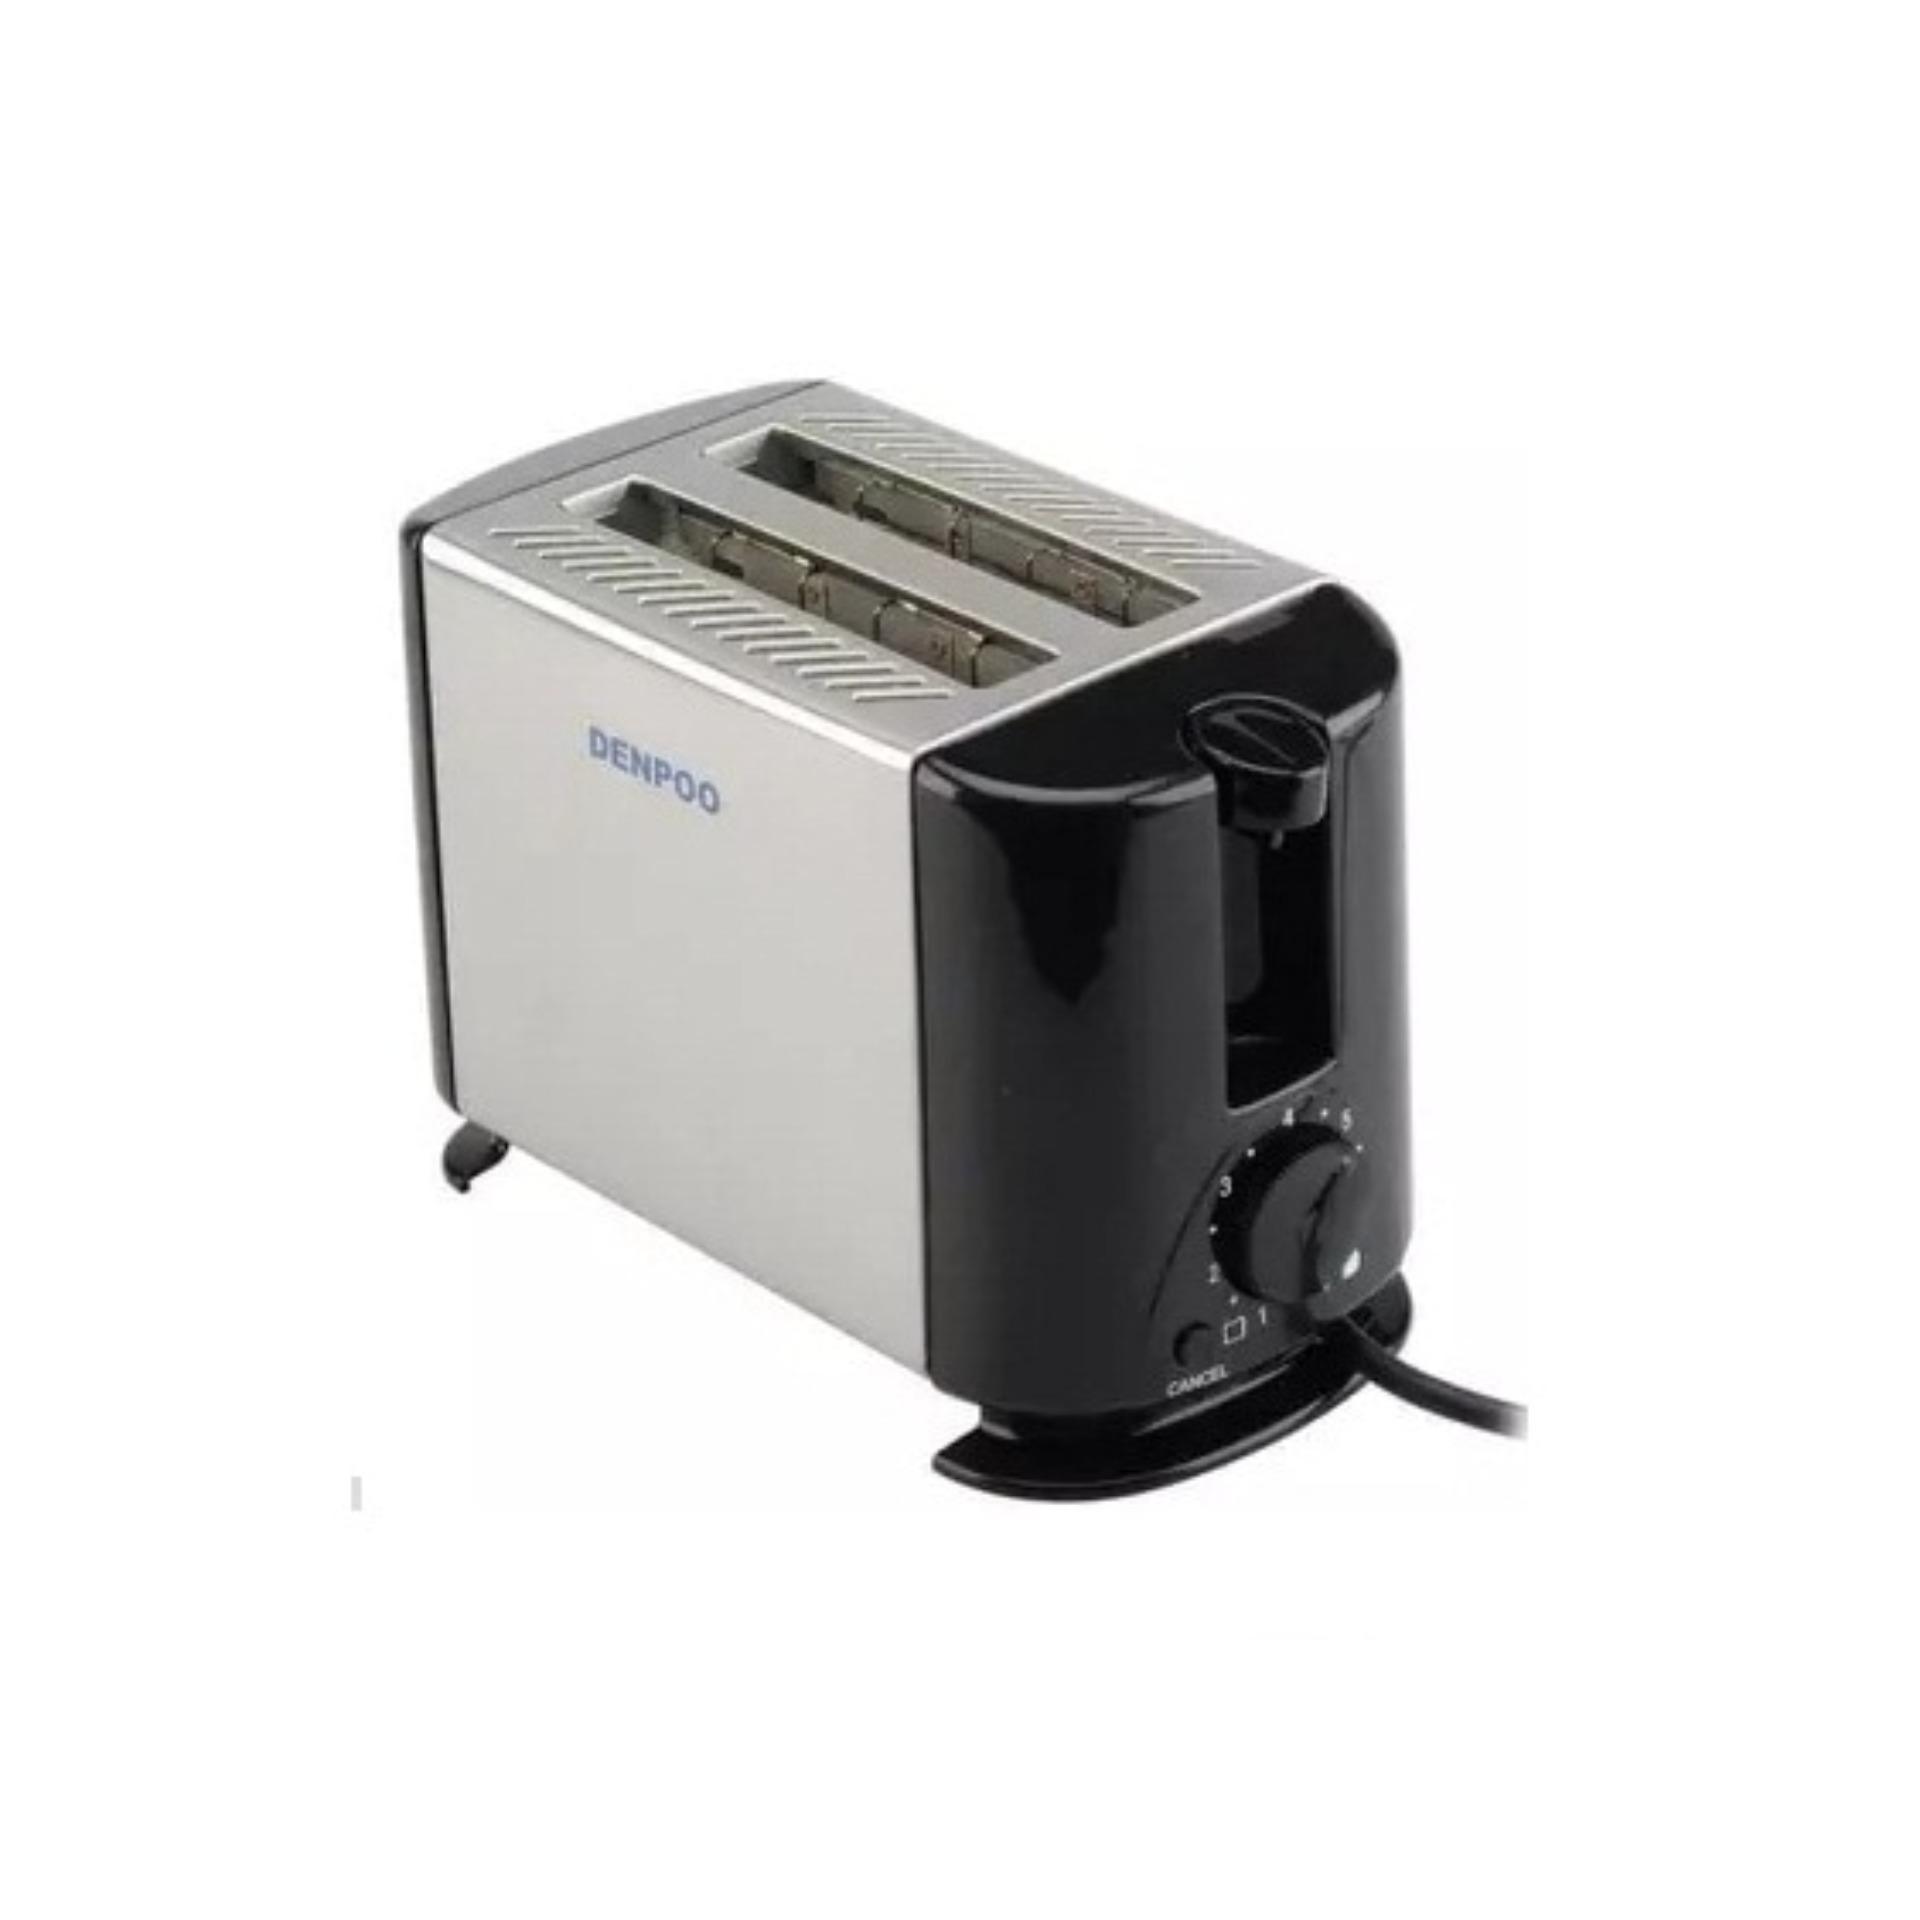 Denpoo Pemanggang Roti Elektrik DT-022D Toaster